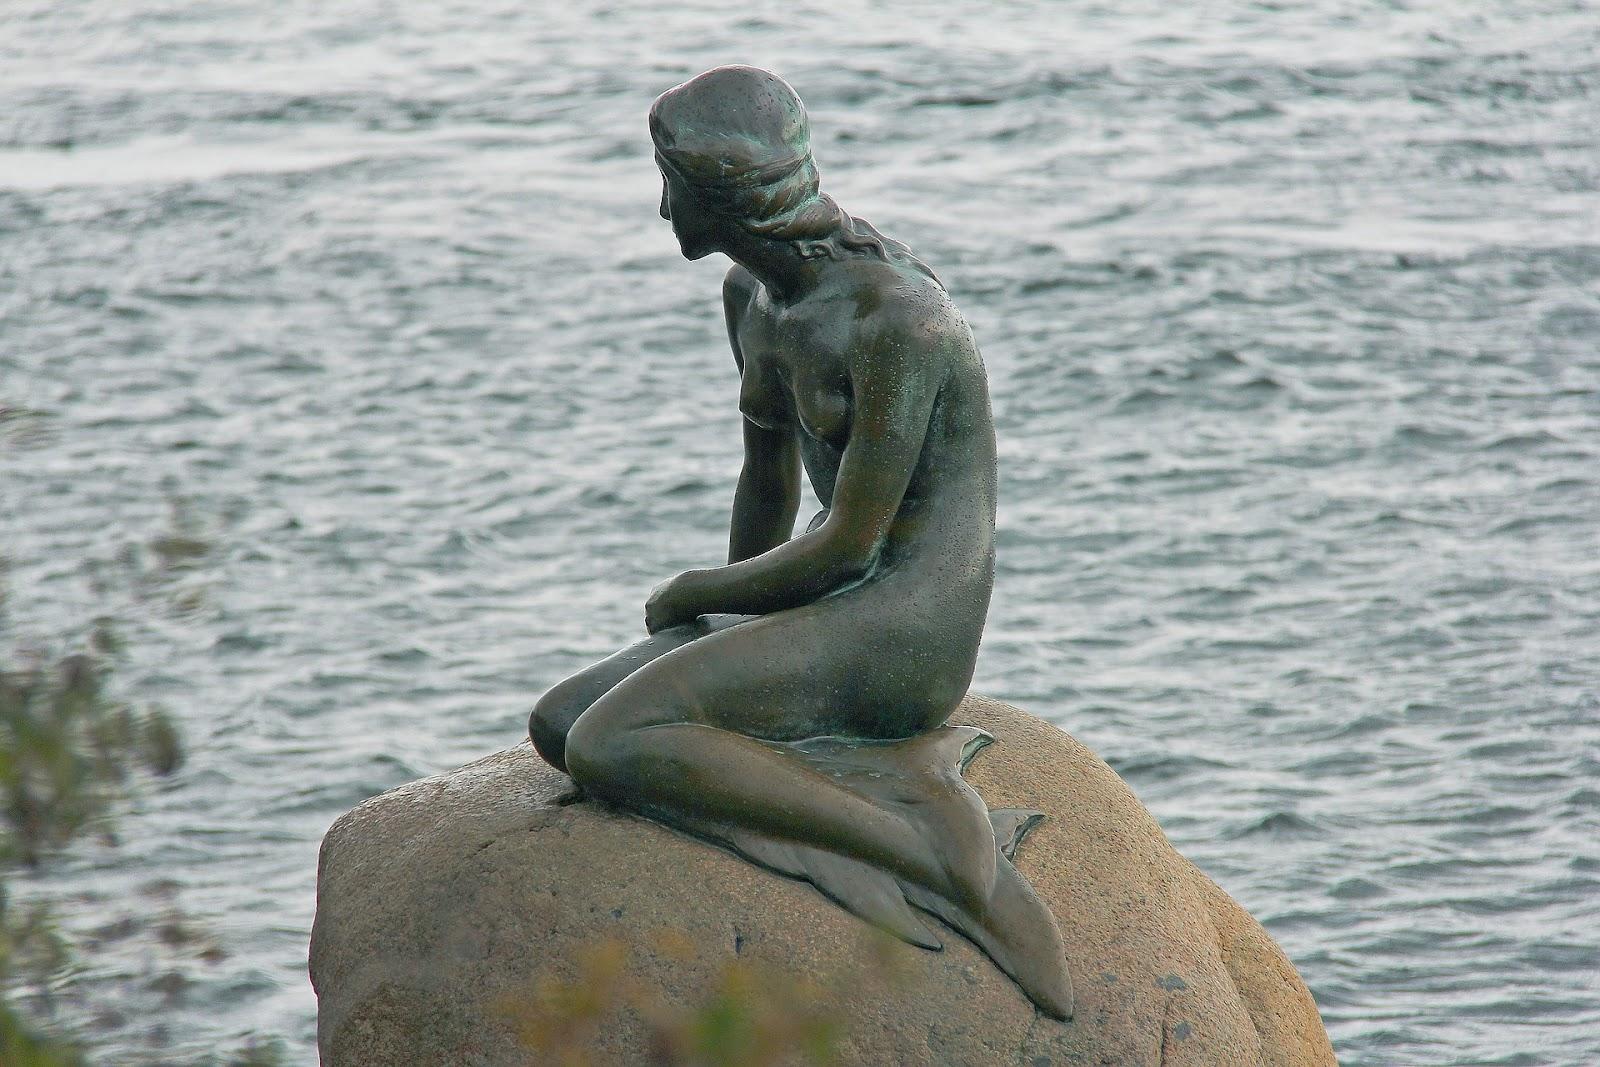 The Little Mermaid Statue in Copenhagen is a nod to Hans Christian Andersen's classic fairy tale story.